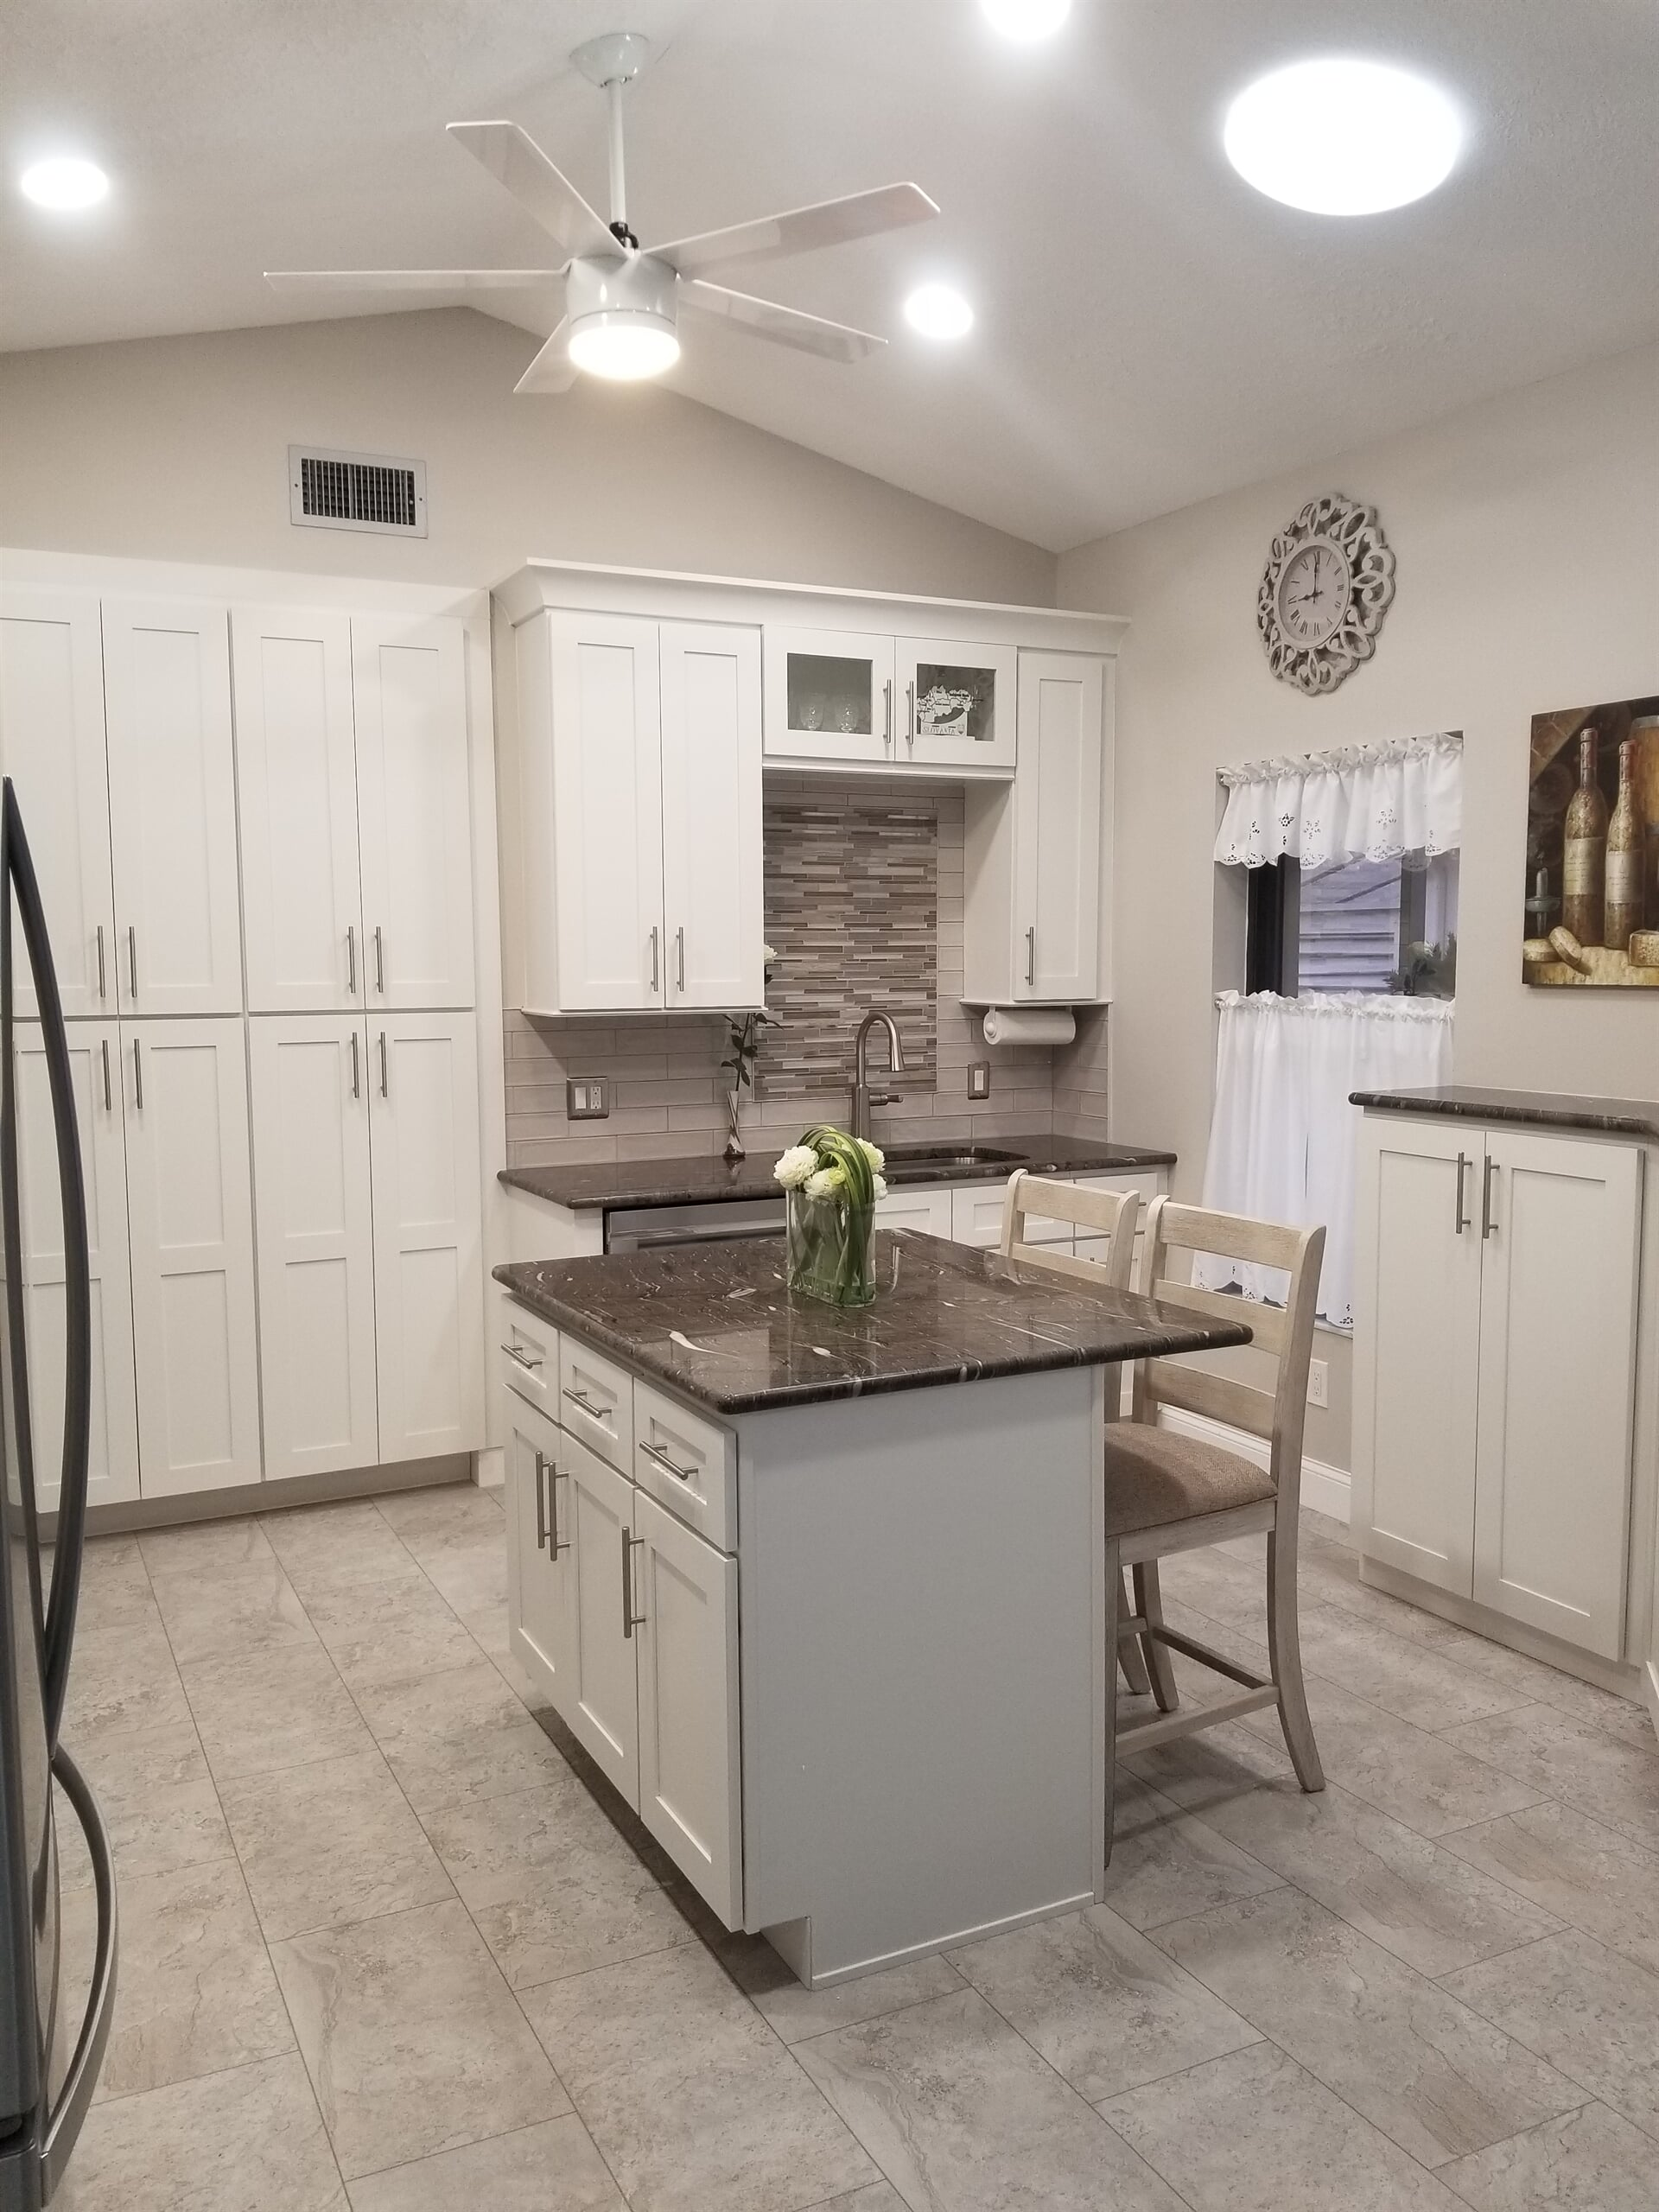 Dark granite countertops in Stuart, FL from Agler Kitchen, Bath & Floors